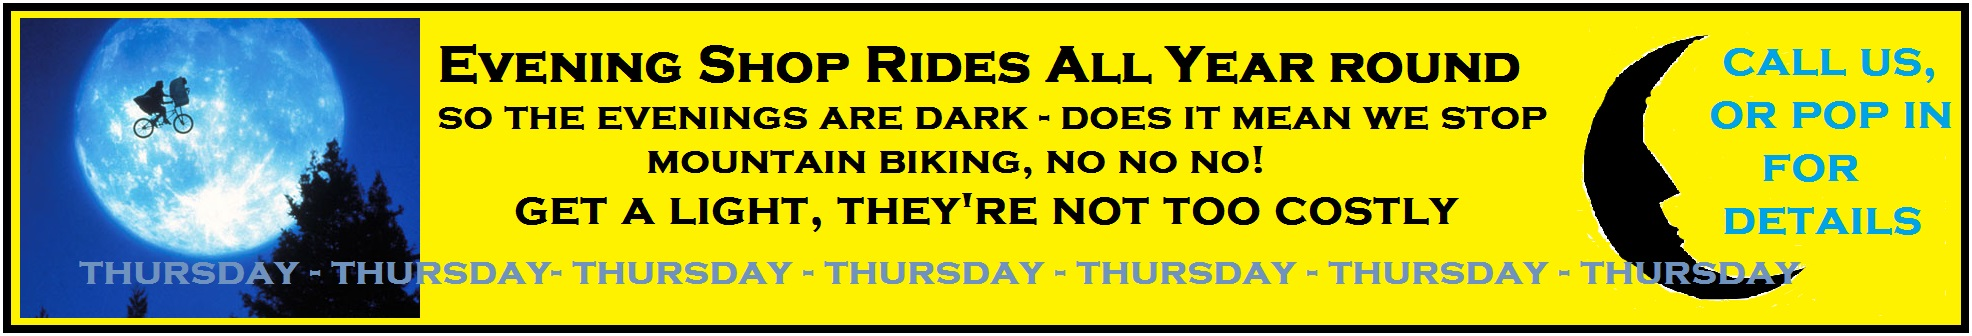 night ride banner